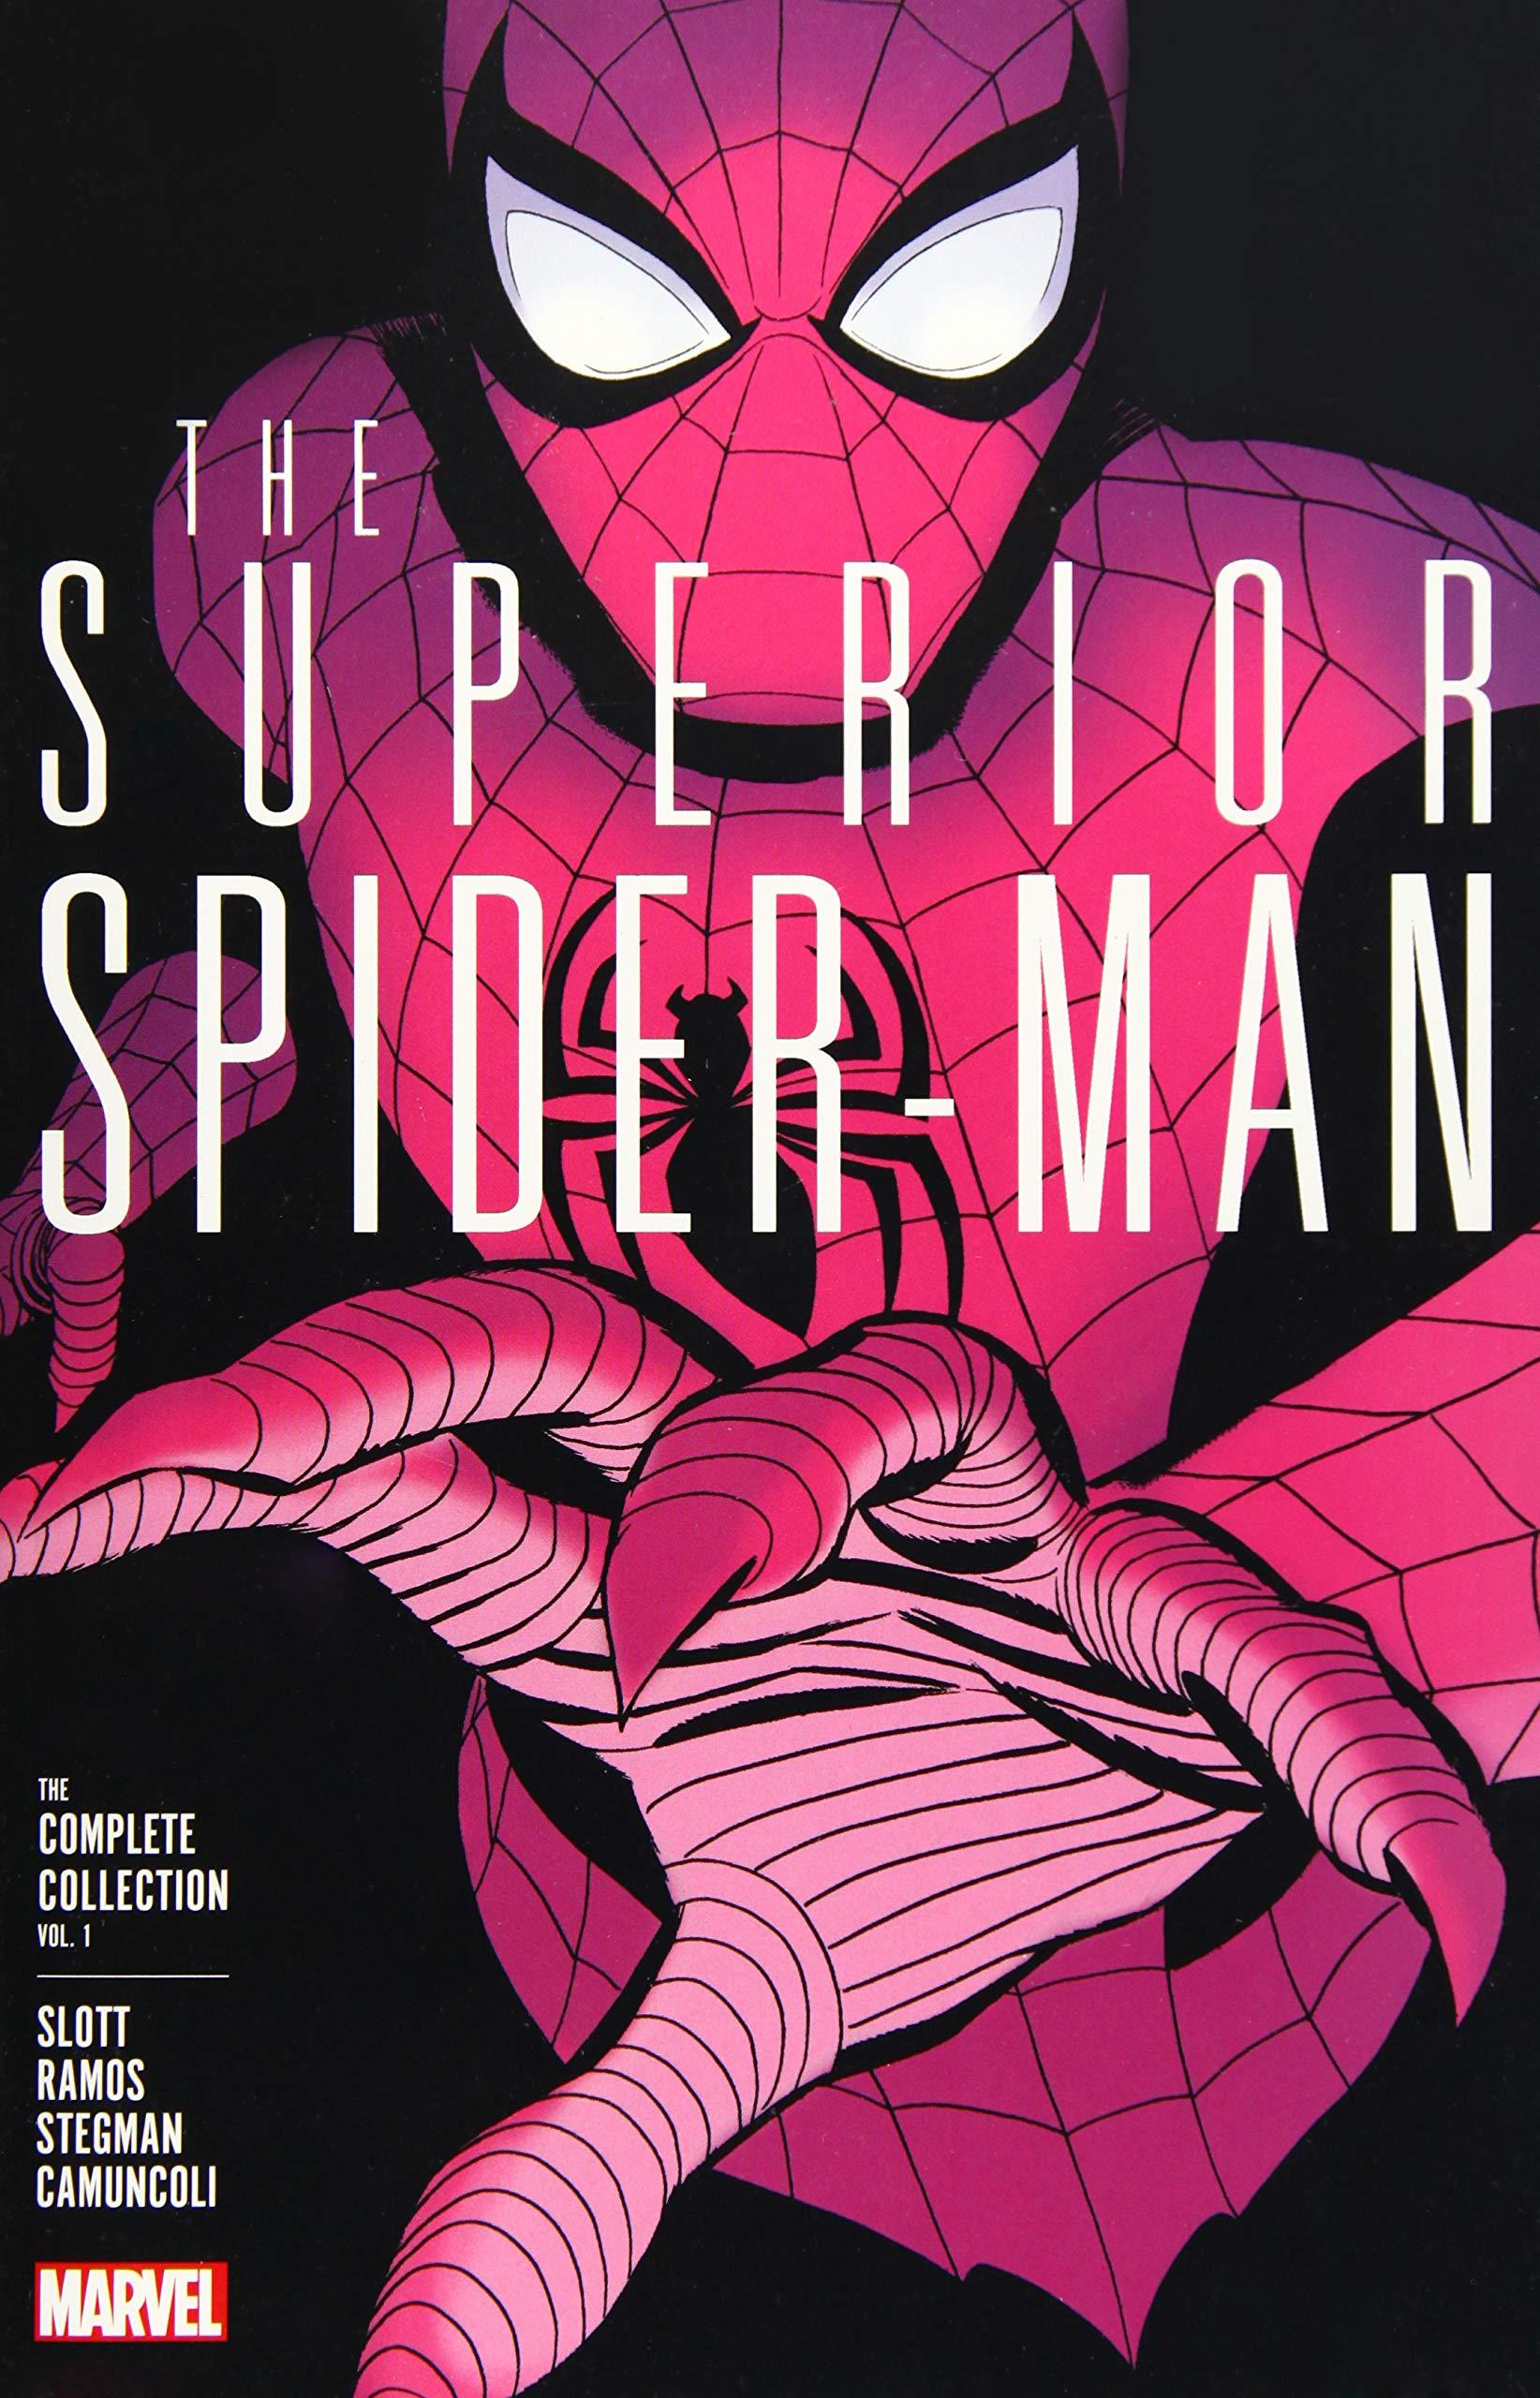 Amazing Spider-Man 7 8 9 10 11 12 13 14 15 Complete Spider-Verse Comic Lot Set